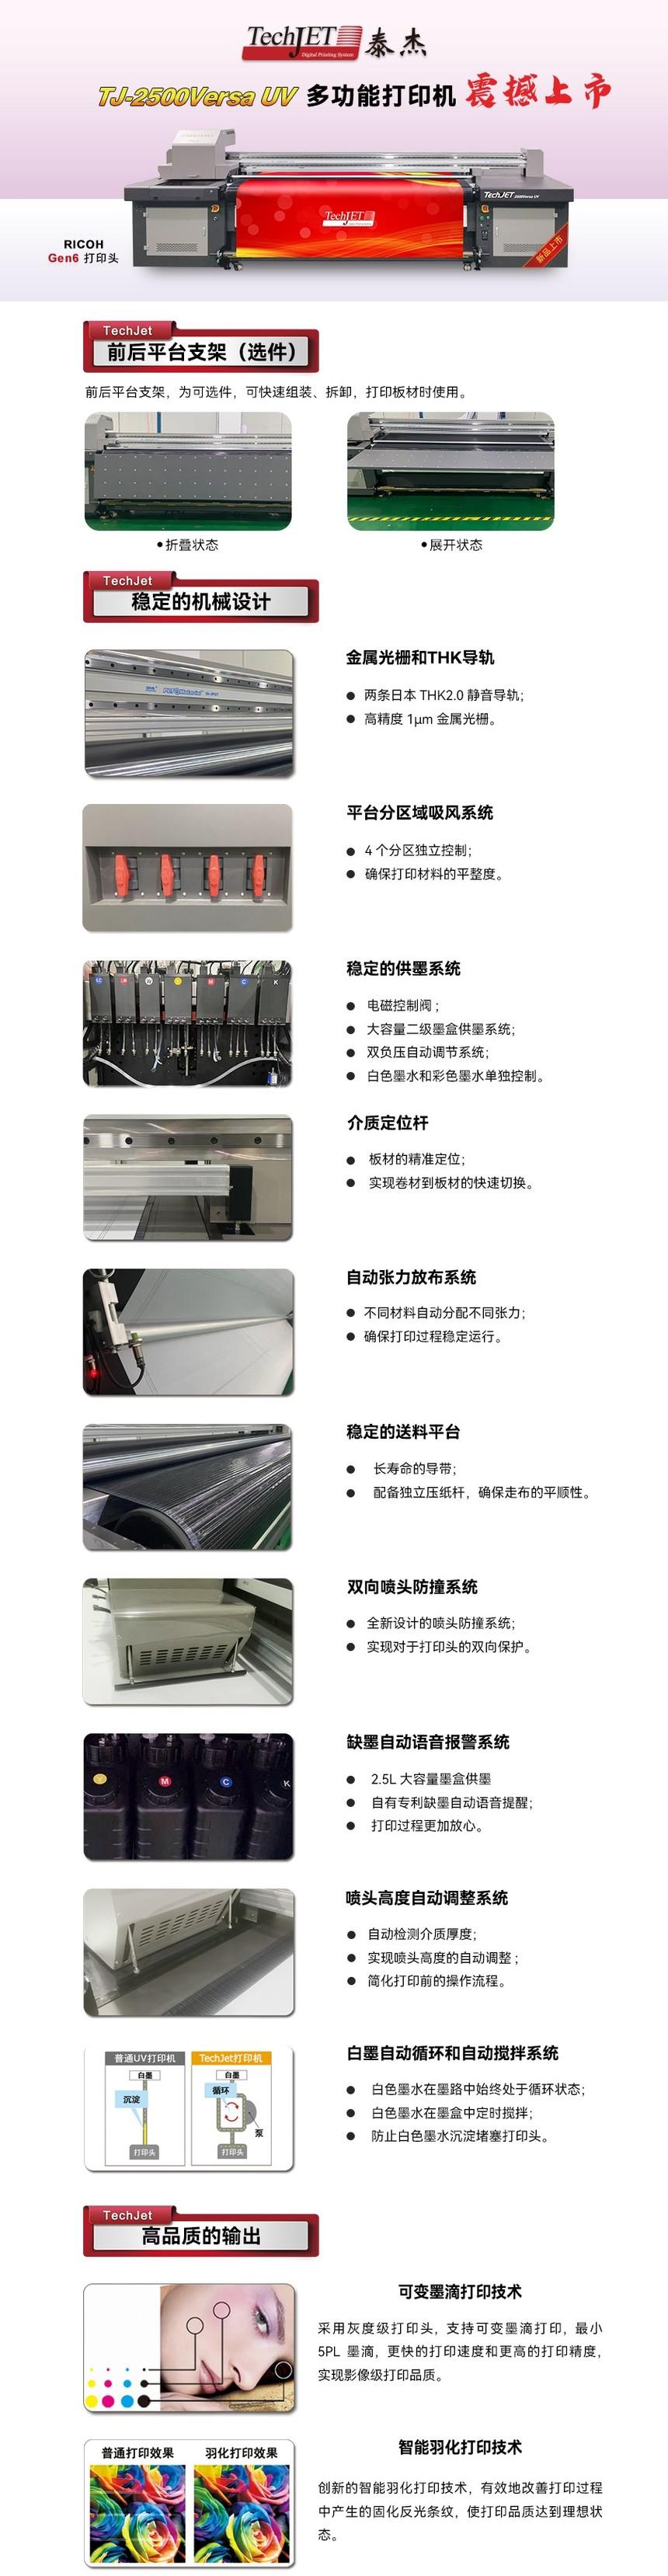 TJ-2500Versa-UV中文产品说明(1).jpg